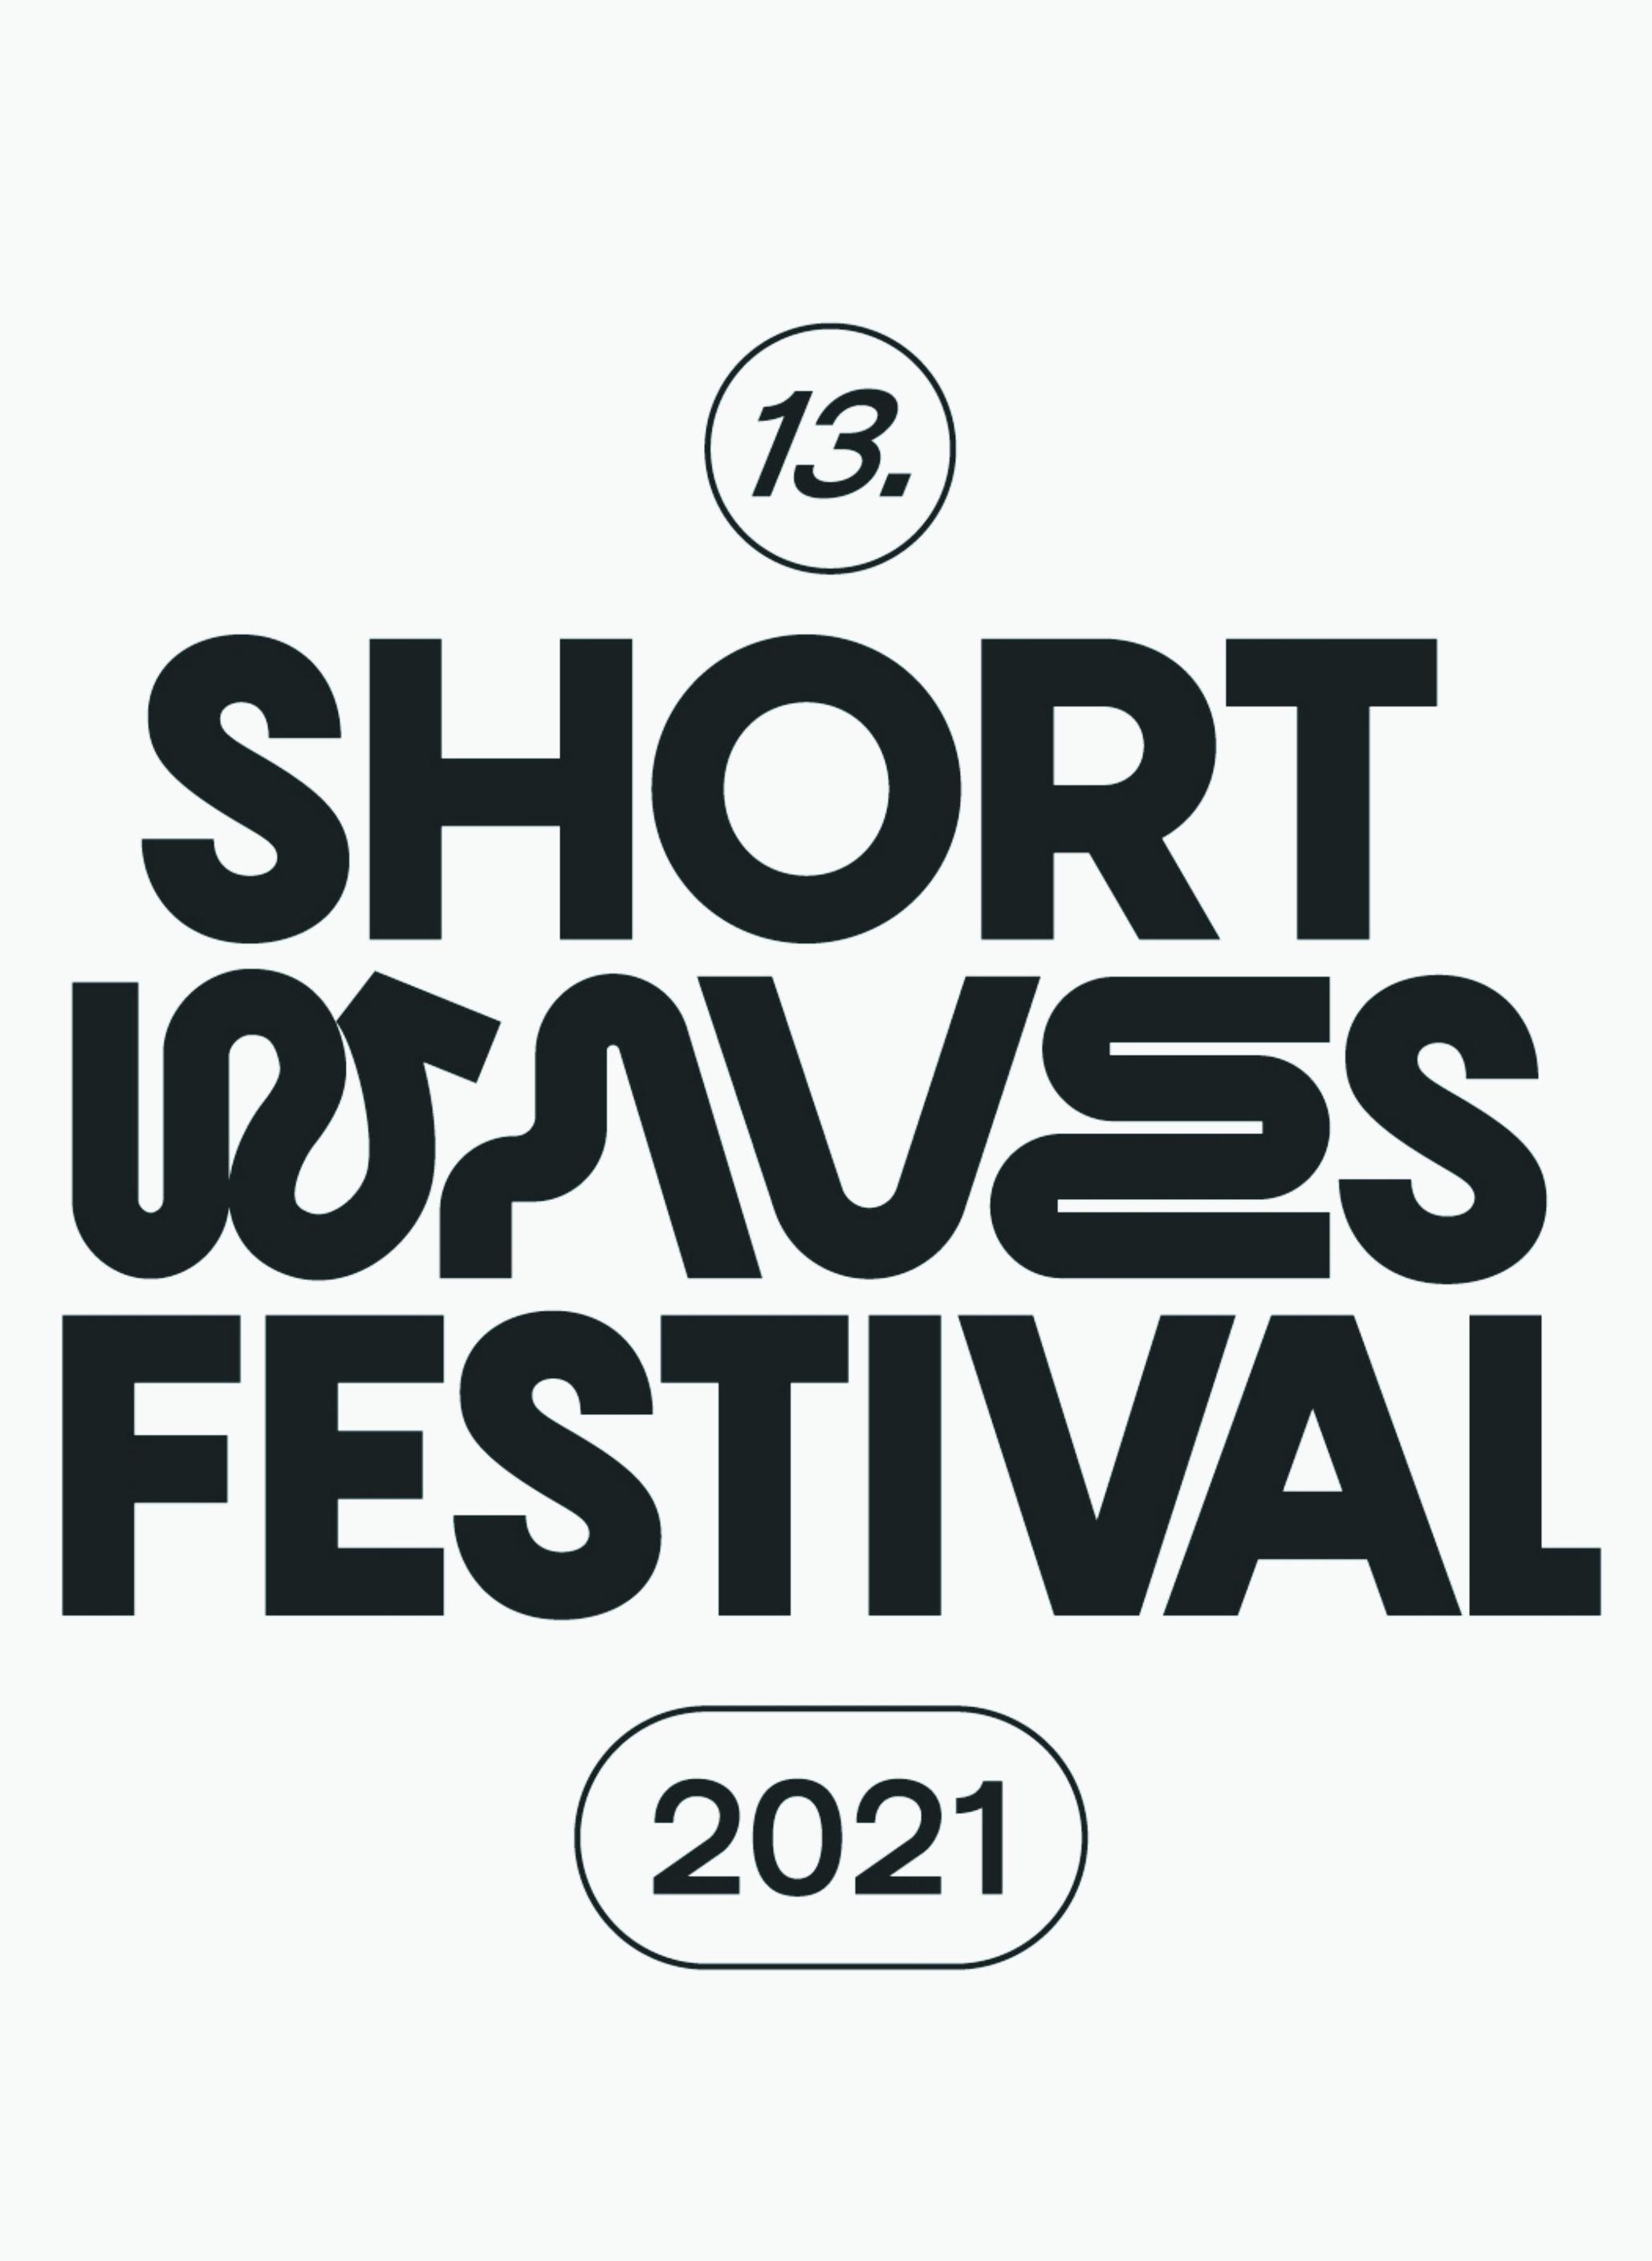 Short Waves Festival 2021 - Urban View I